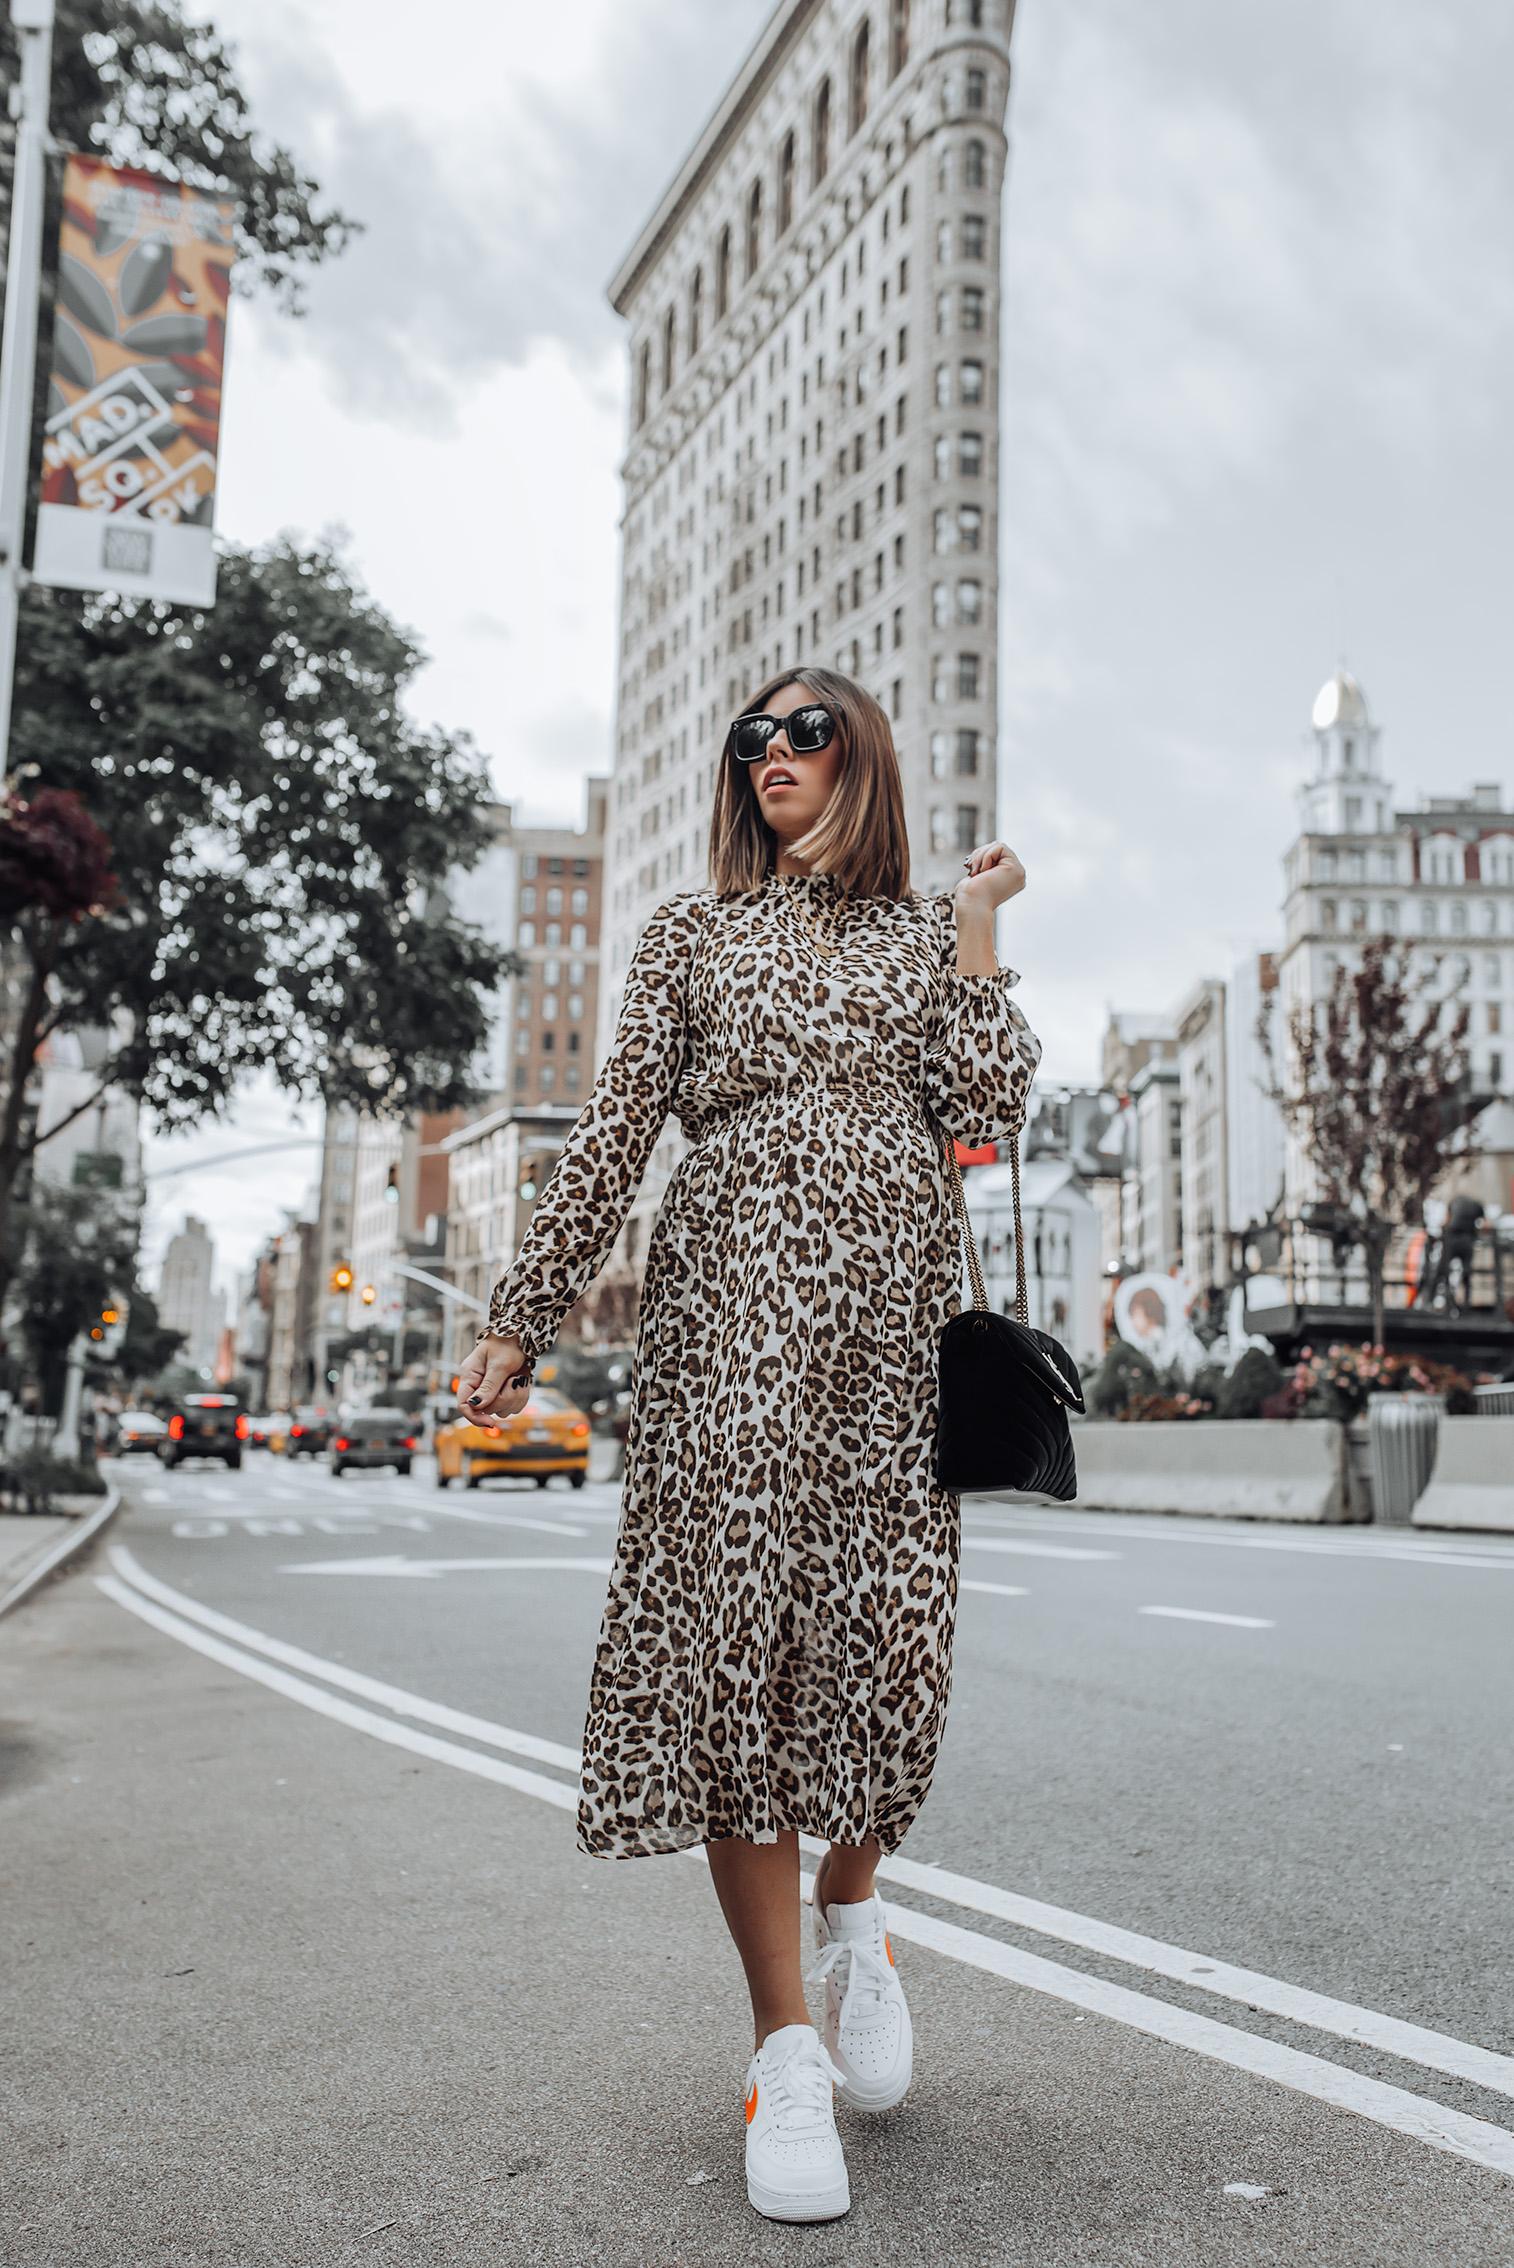 Leo print dress | #leopard #liketkit #nikeoutfits #celine sunglasses #nikeairforce #streetstyle | Leo Print Dress | Nike Air Force | YSL Bag